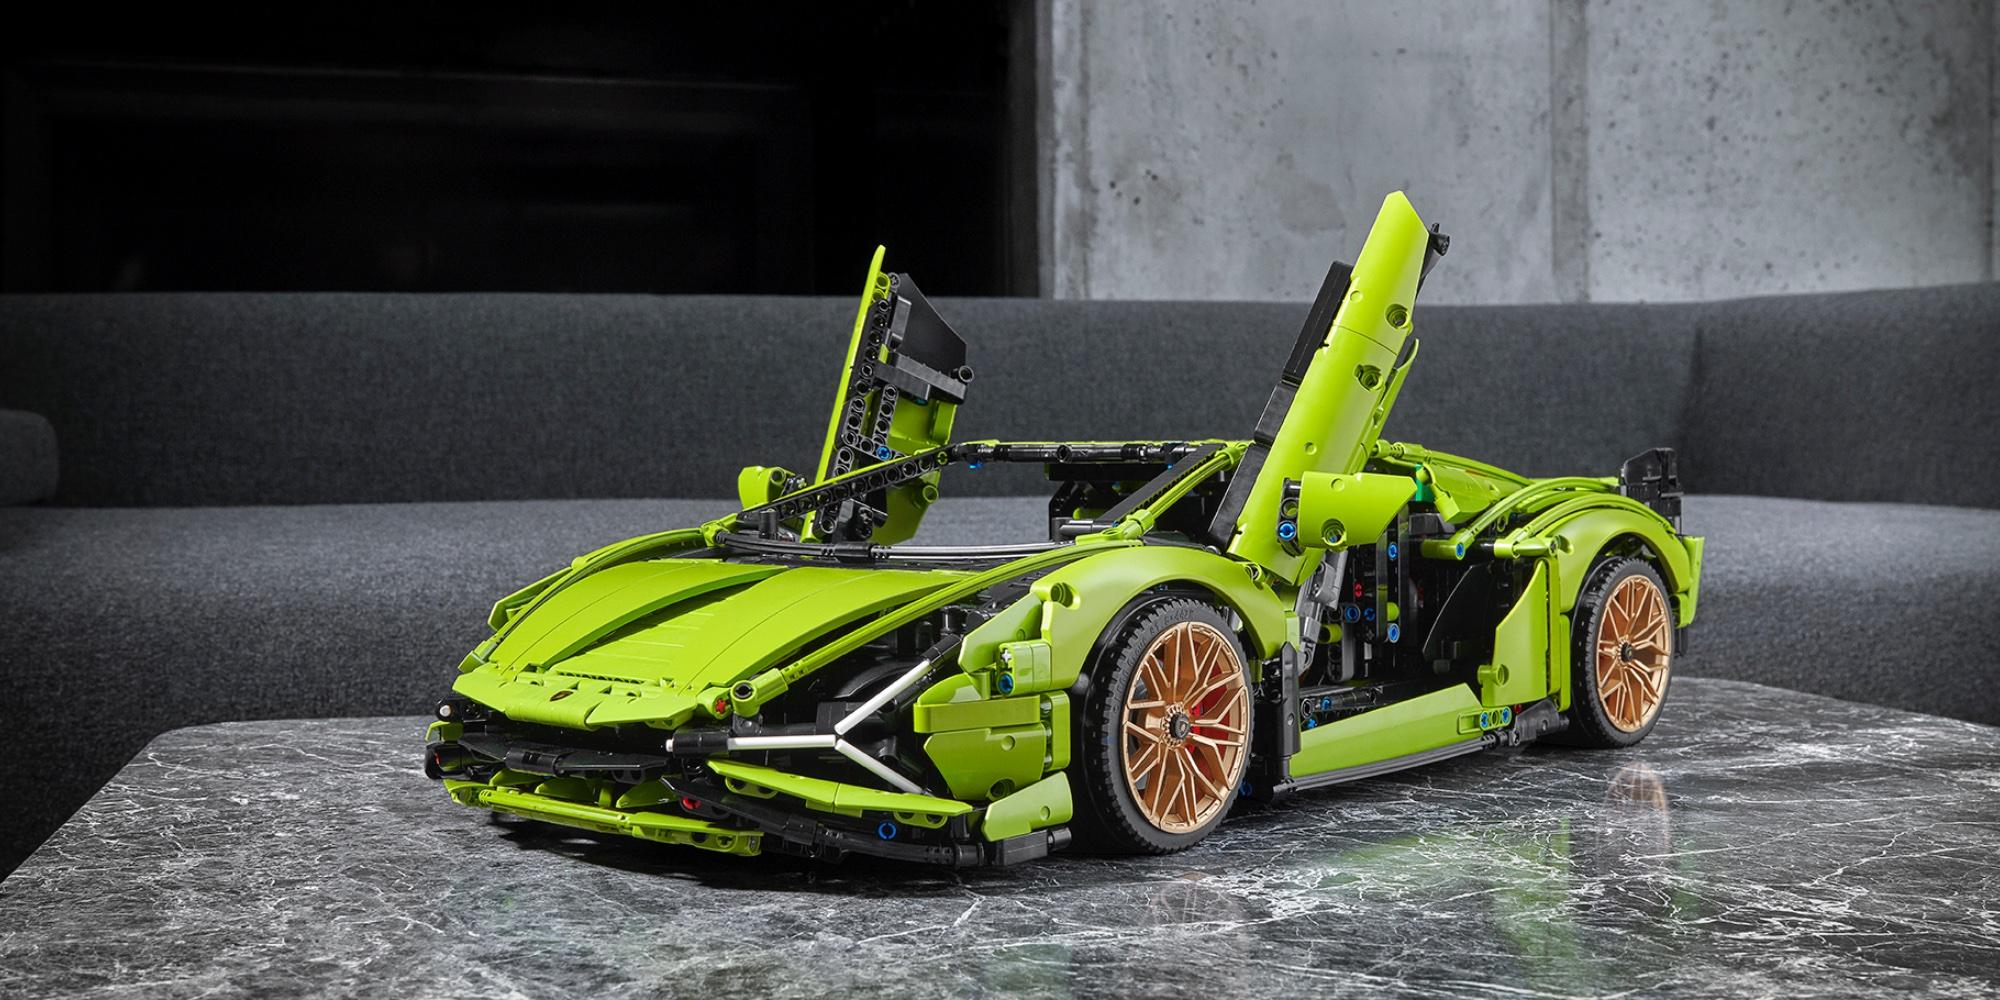 LEGO Lamborghini debuts as new 3,700-piece Technic kit ...